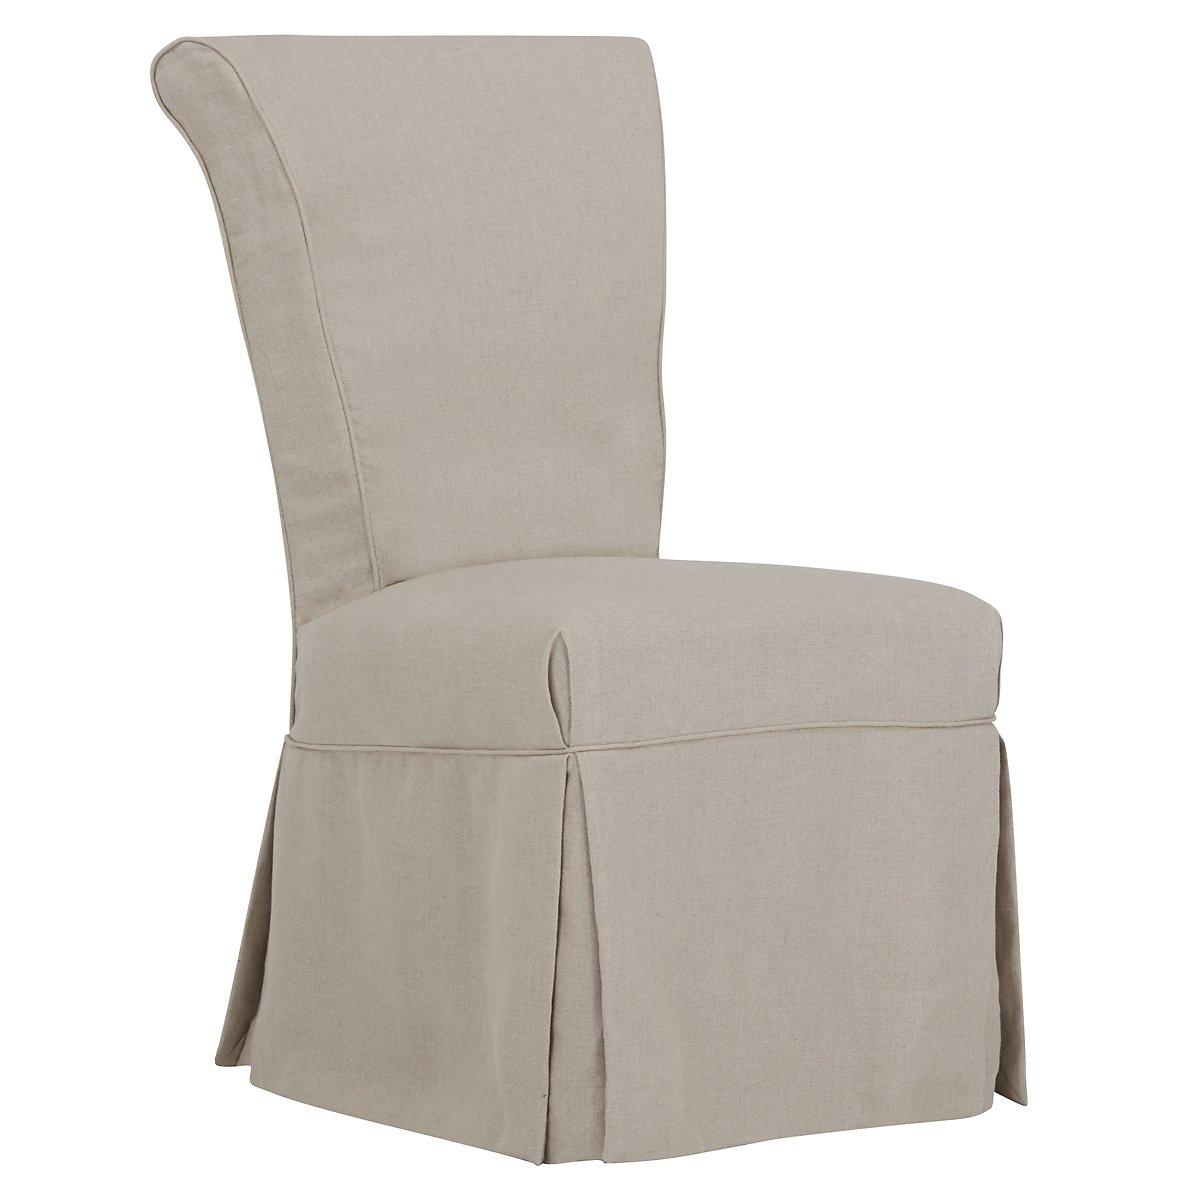 Haddie Beige Skirted Side Chair